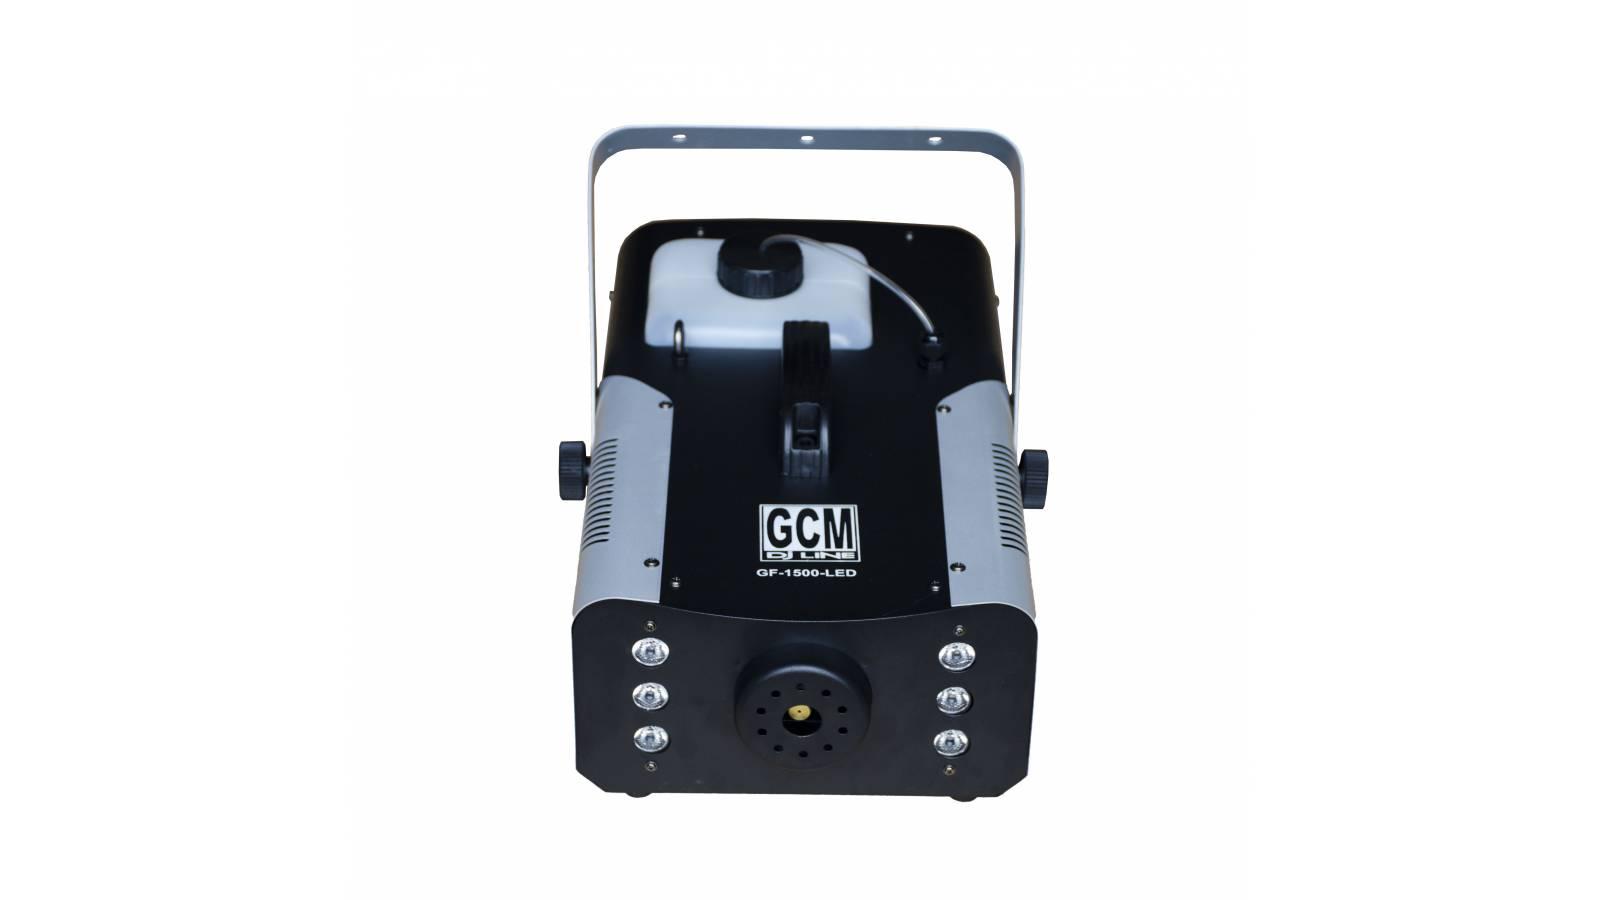 X-TREME Maquina de Humo LED de 1500W GF-1500W-LED + Control Remoto GCM Pro